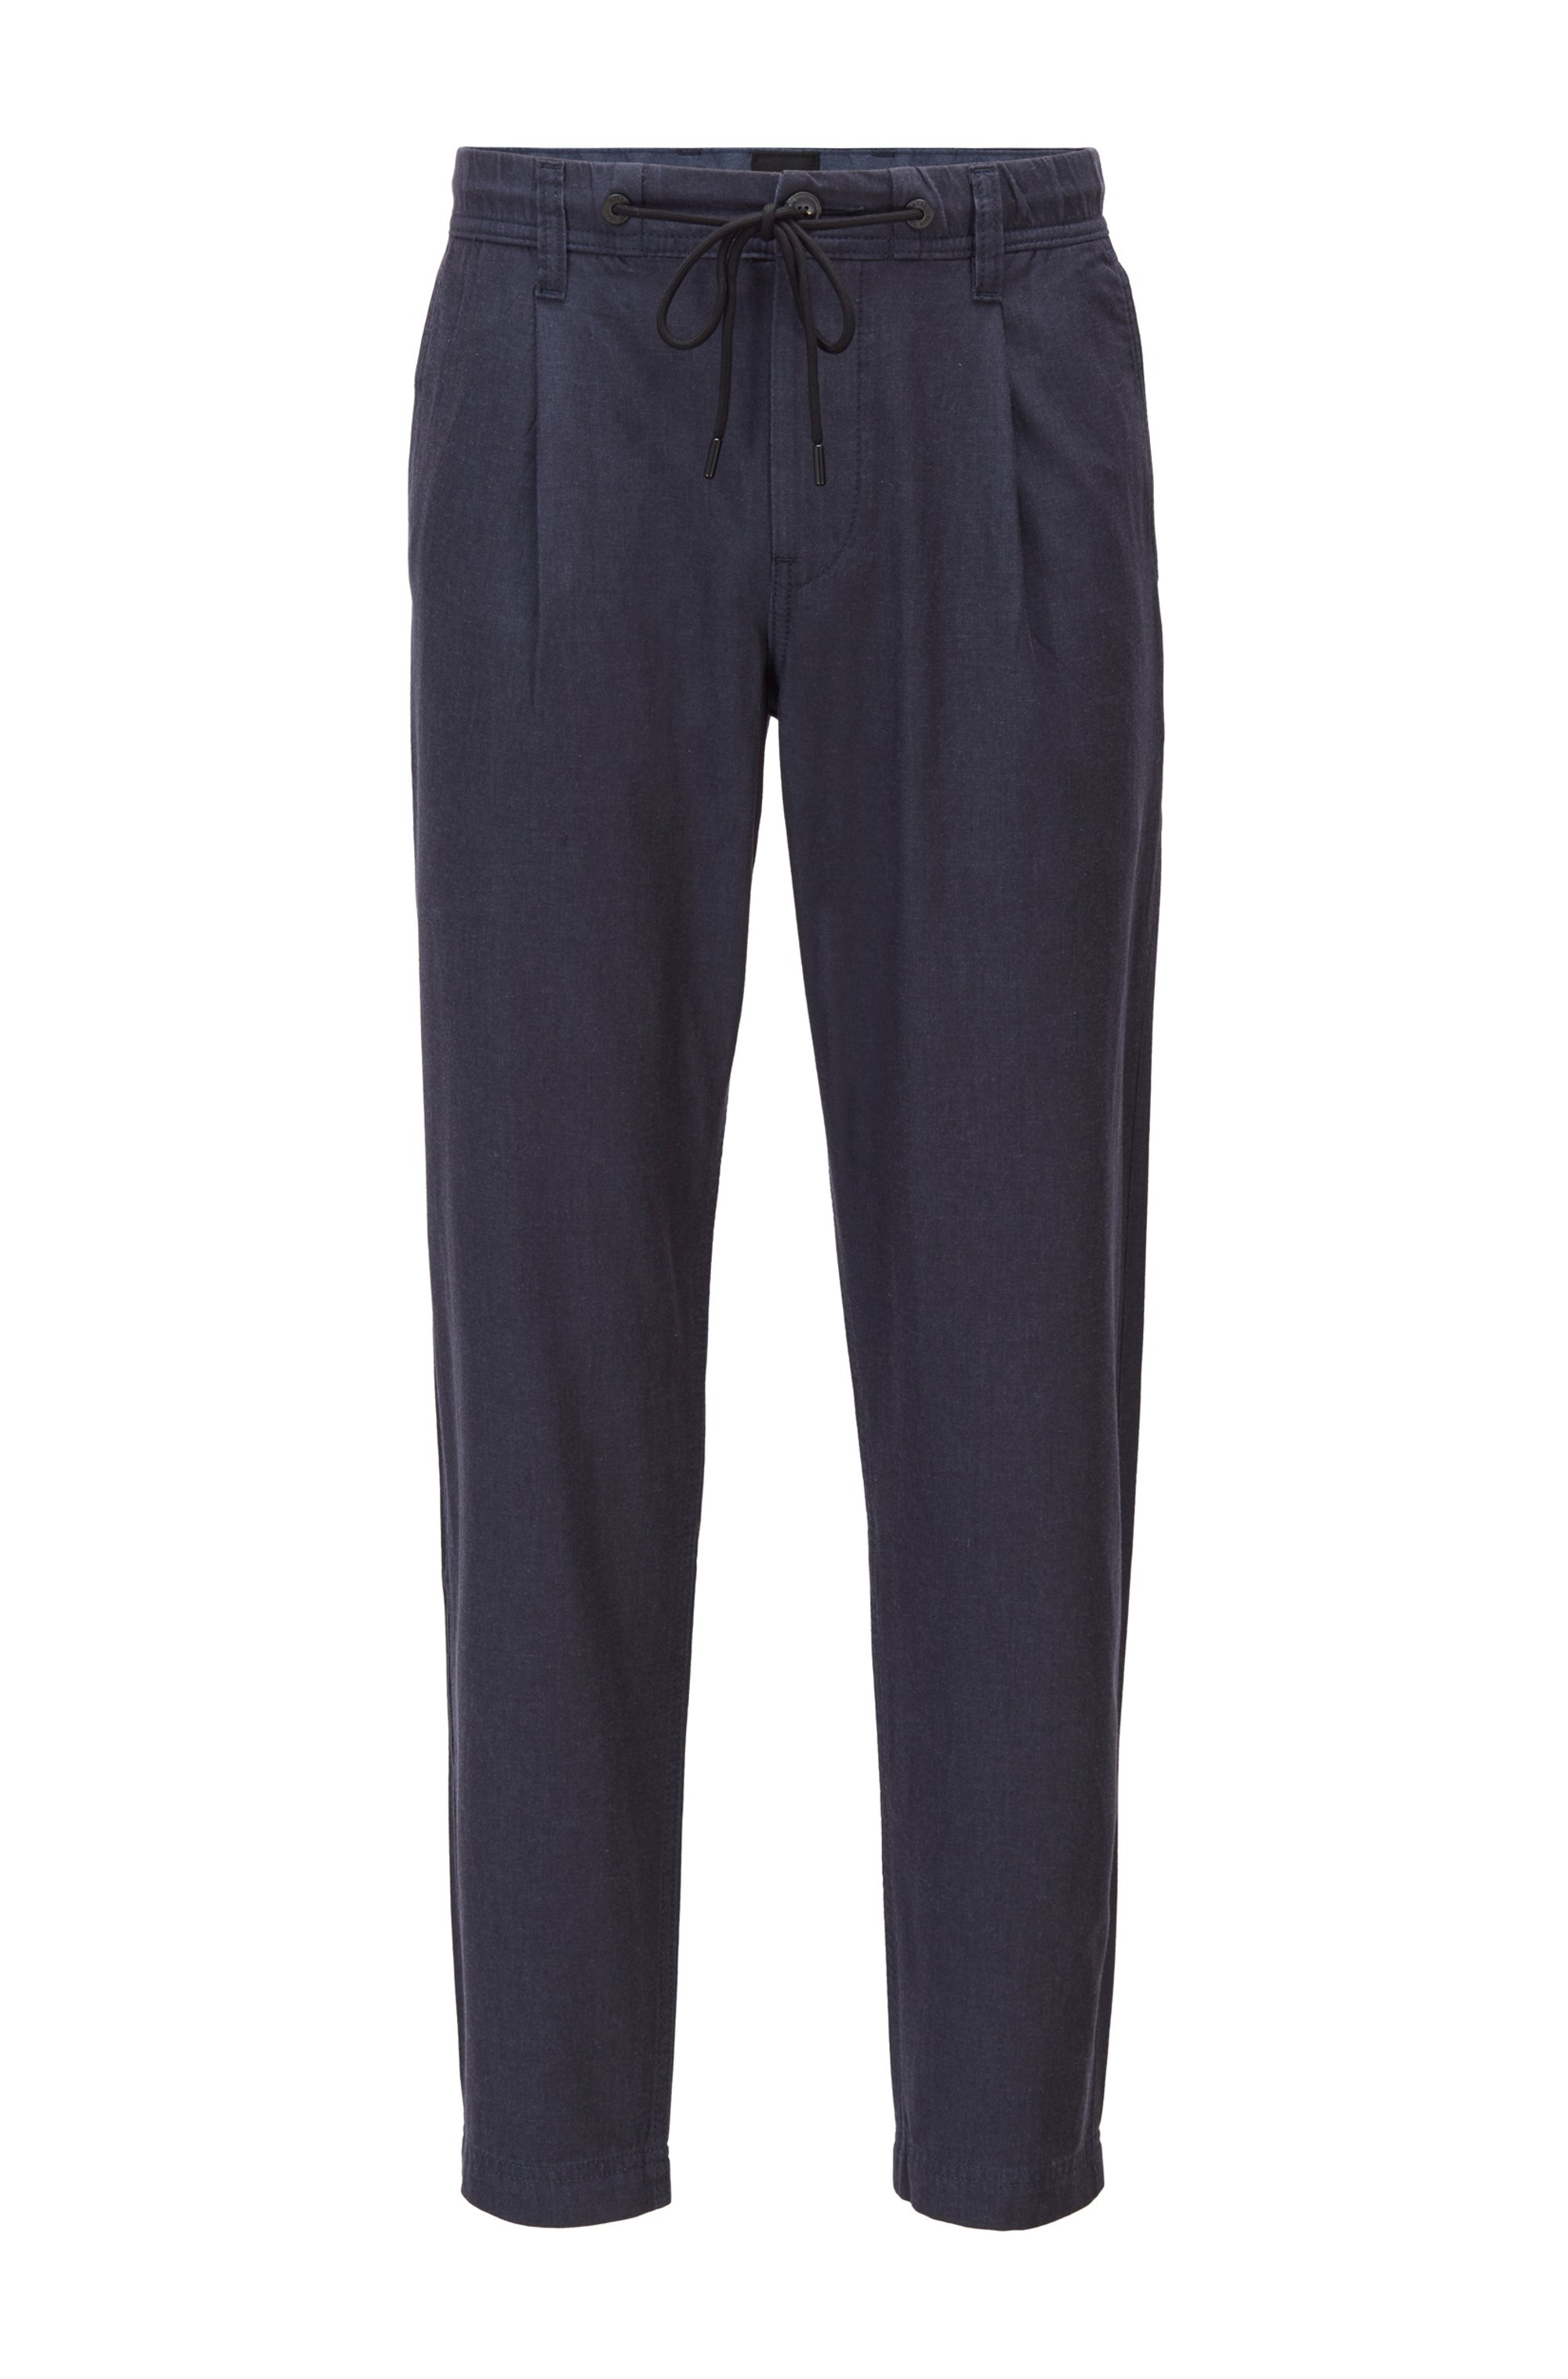 Tapered-fit drawstring pants in super-soft stretch twill, Dark Blue